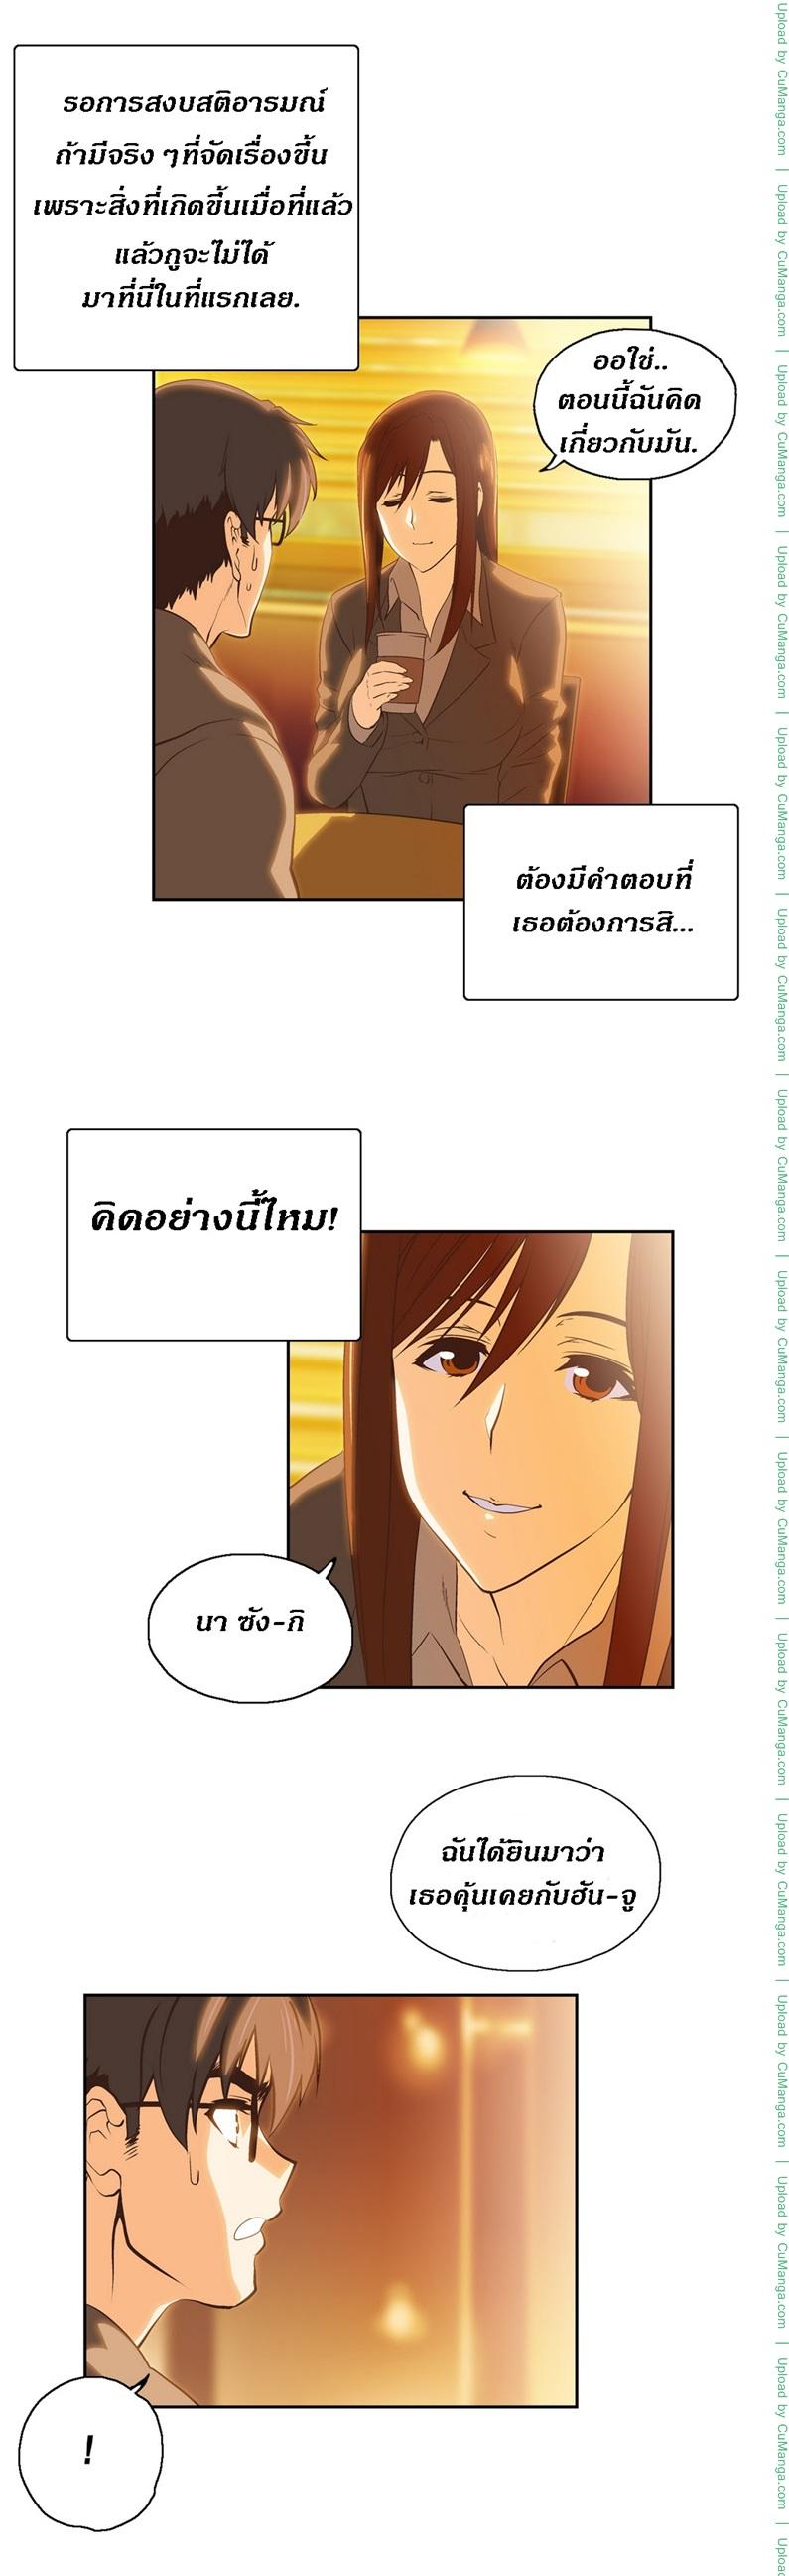 SStudy 45 - หน้า 6